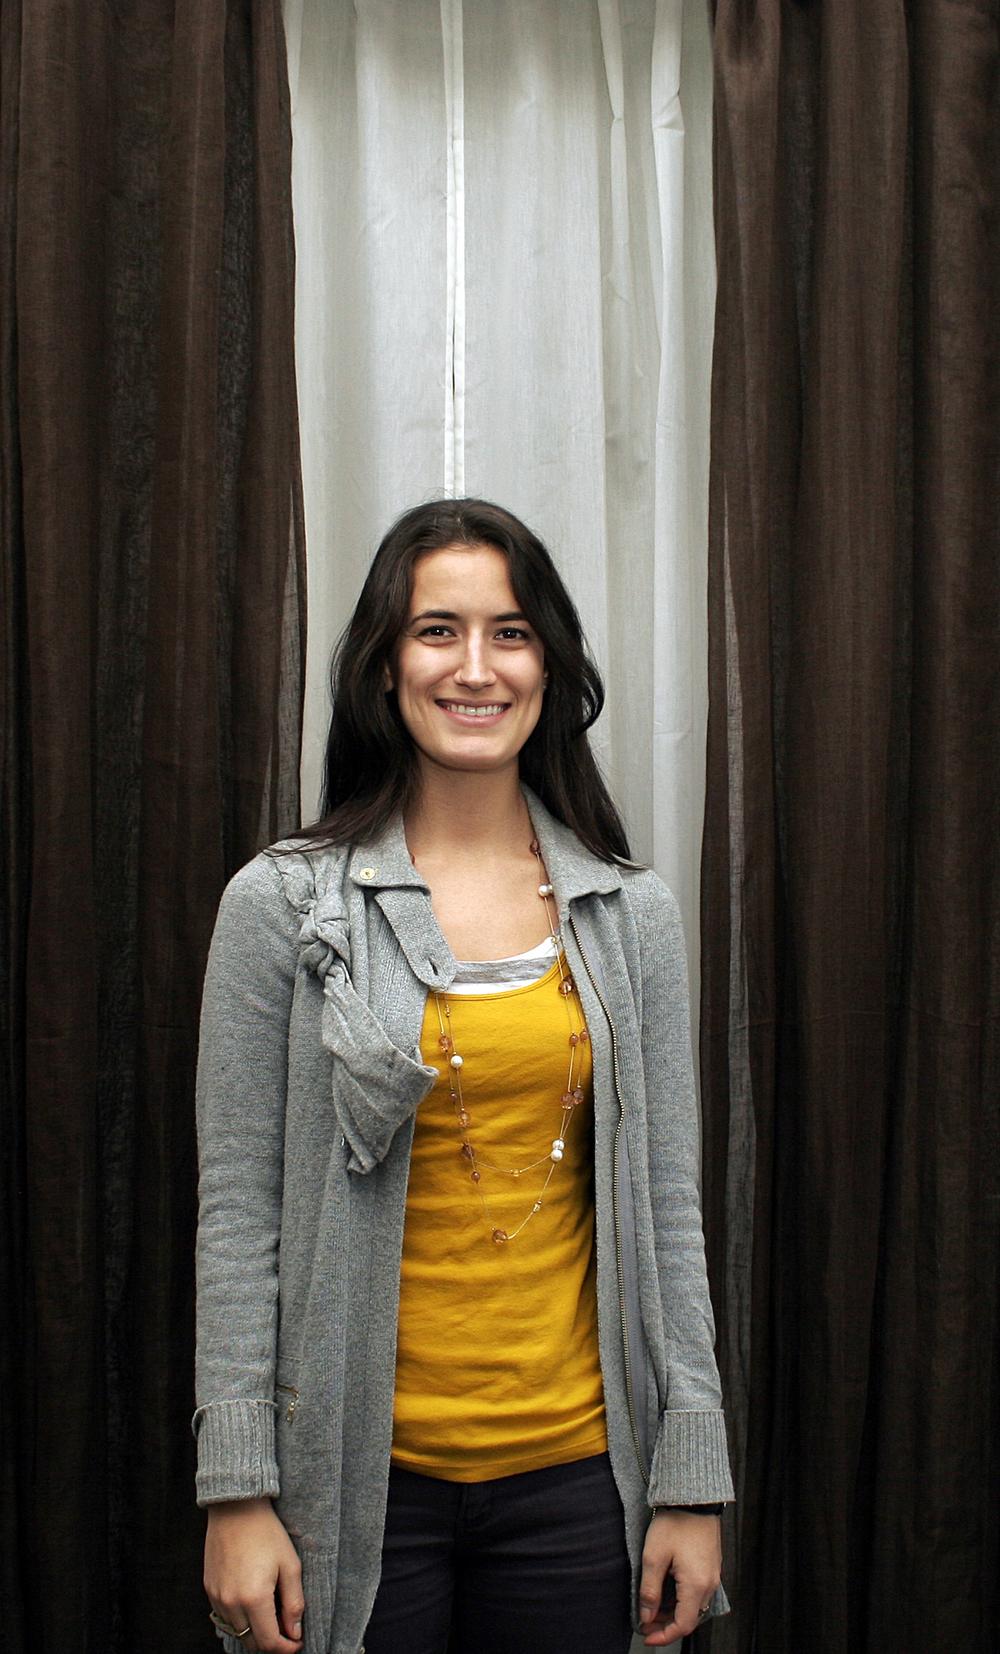 Karen Gereffi Goodman